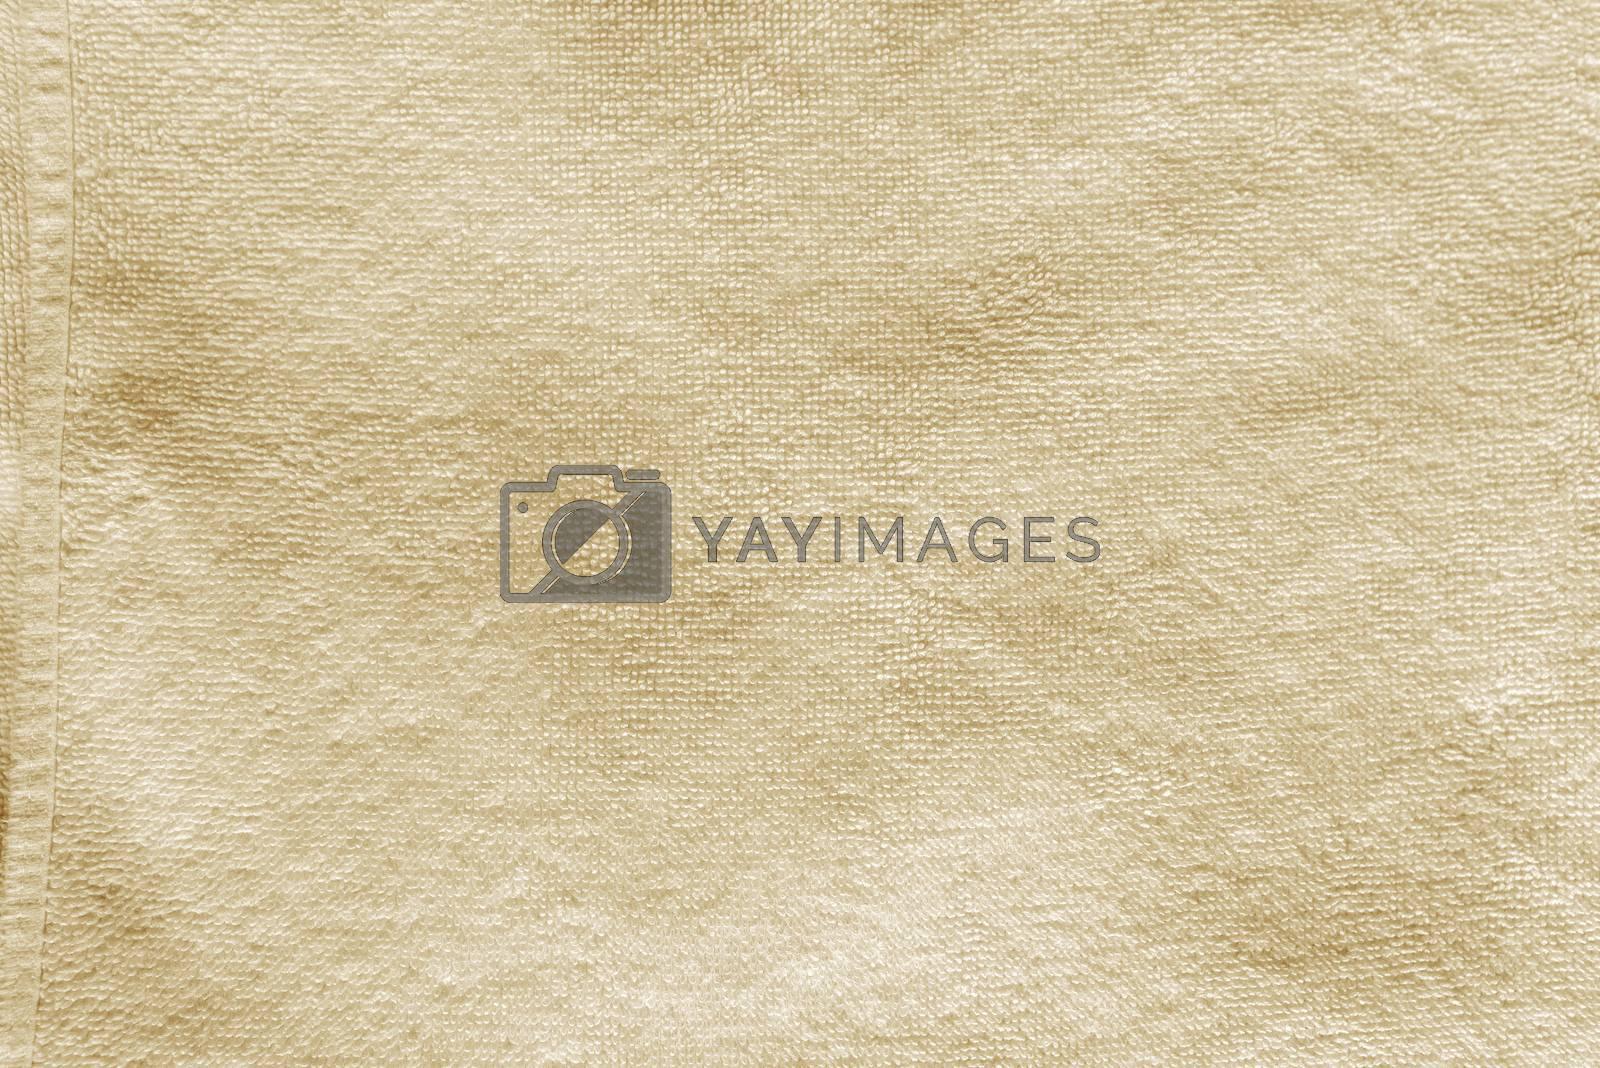 Beige towel texture, high resolution detailed background